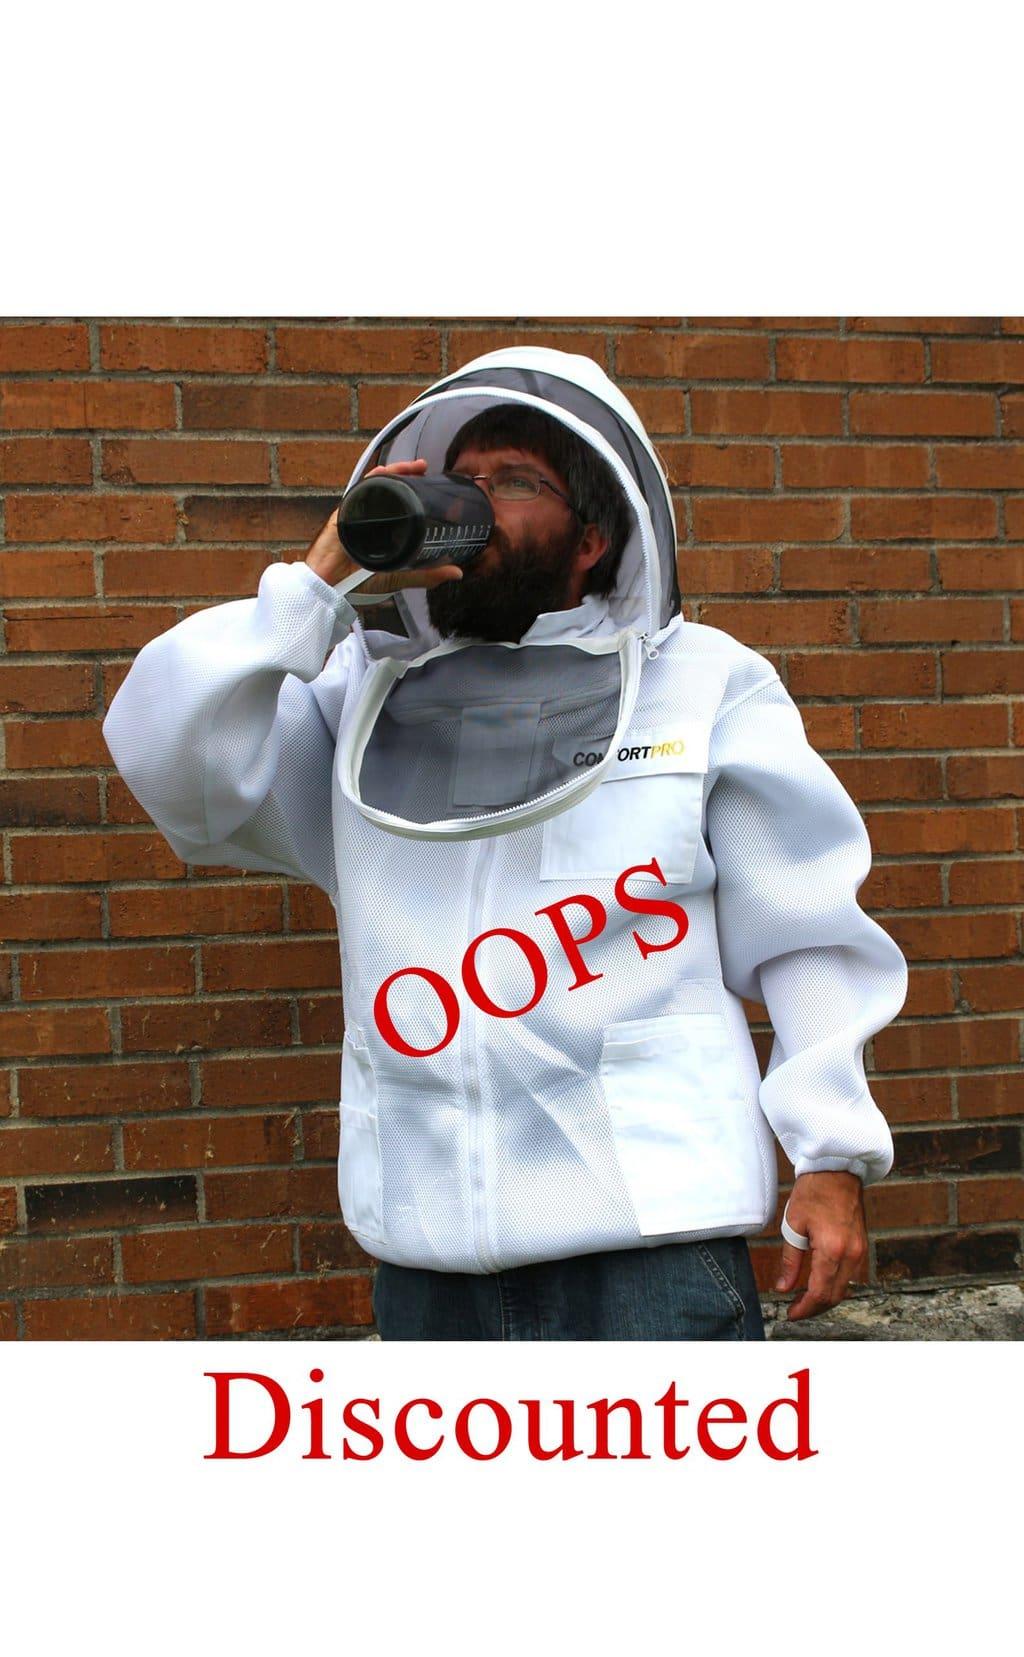 Discounted ComfortPRO Ventilated Beekeeping Jacket